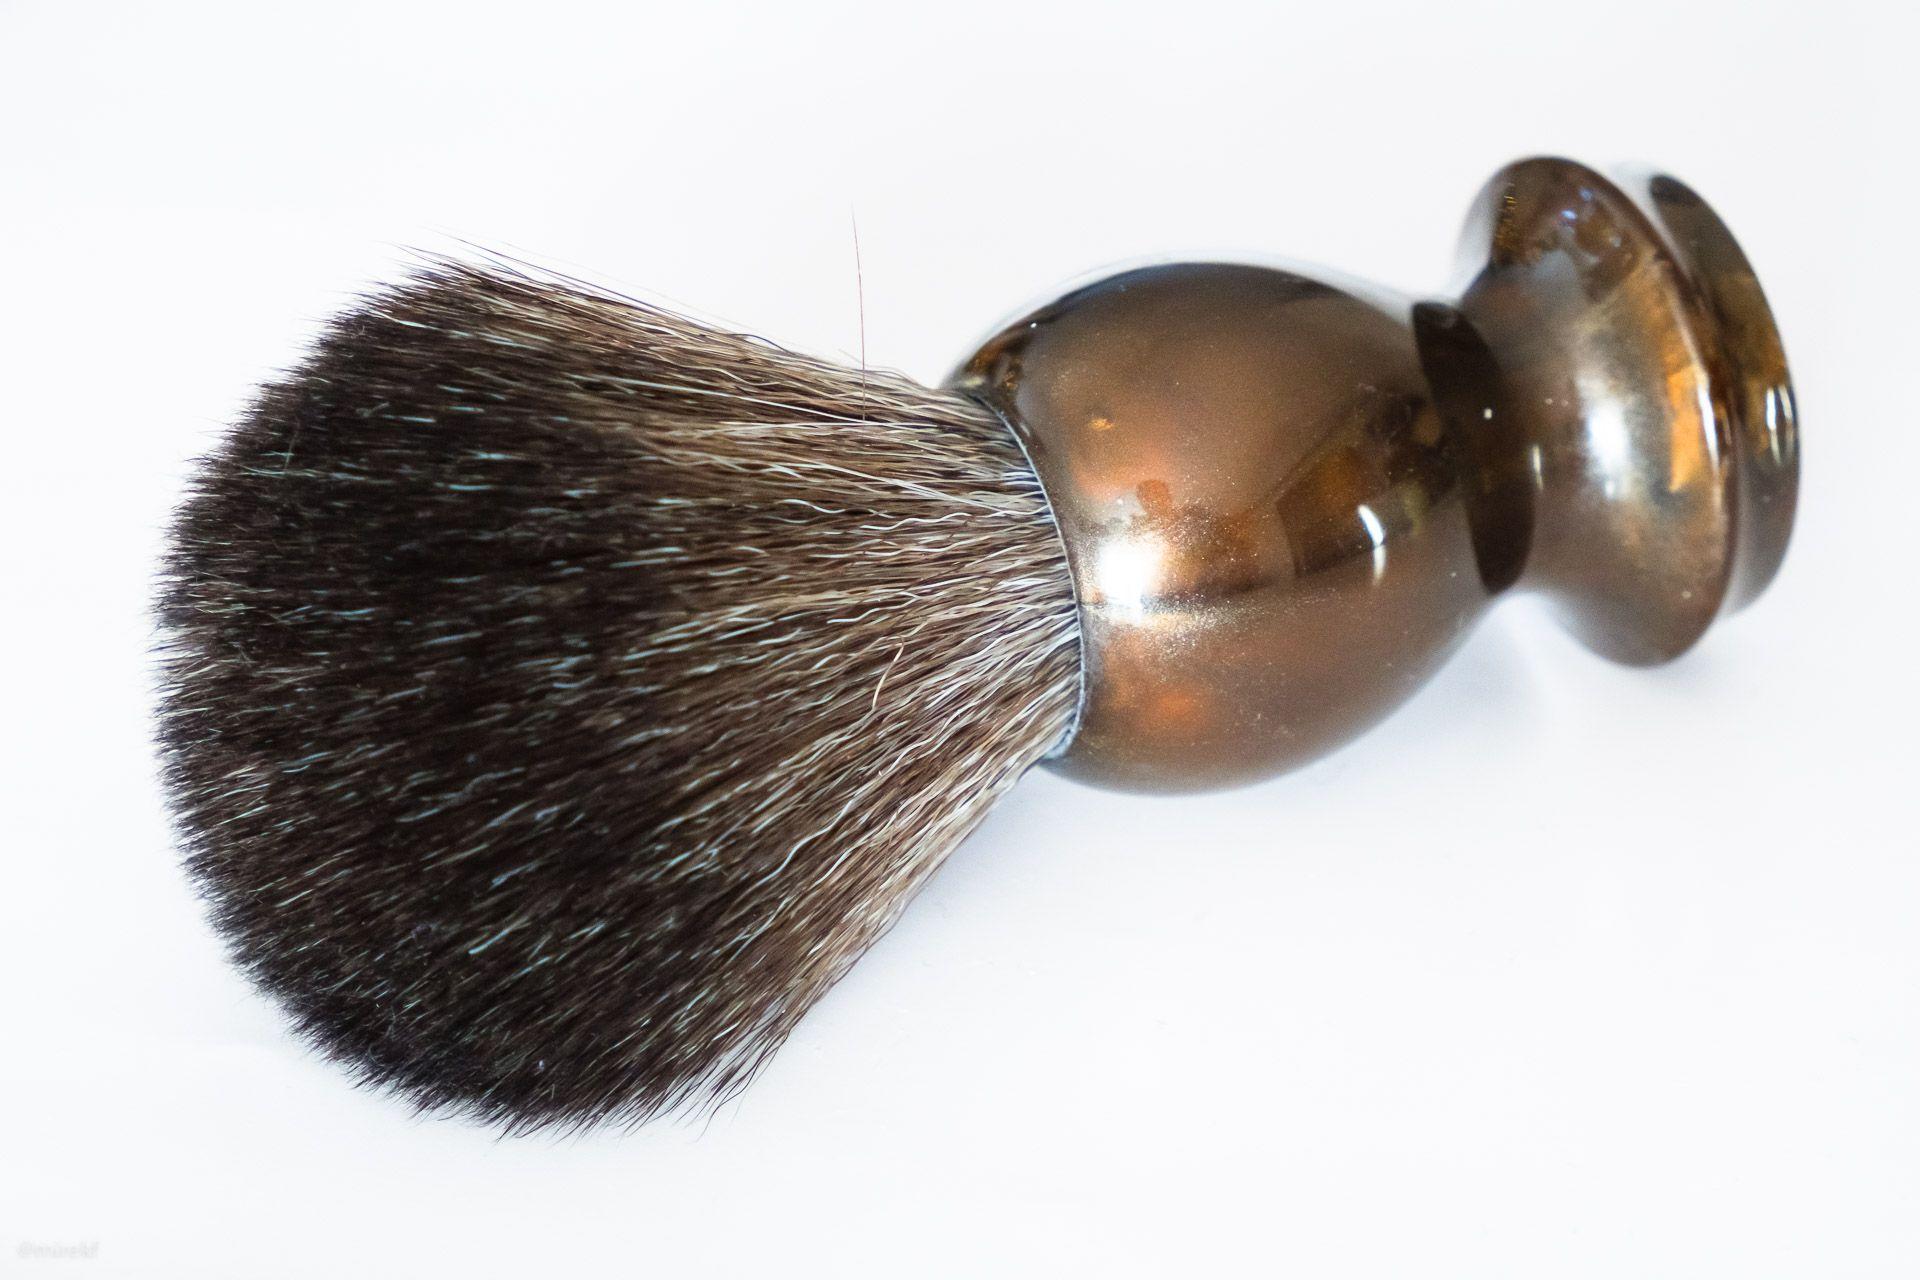 Włosie pędzla do golenia Maggard Razors 22 mm Black Synthetic Shaving Brush, Bronze Handle